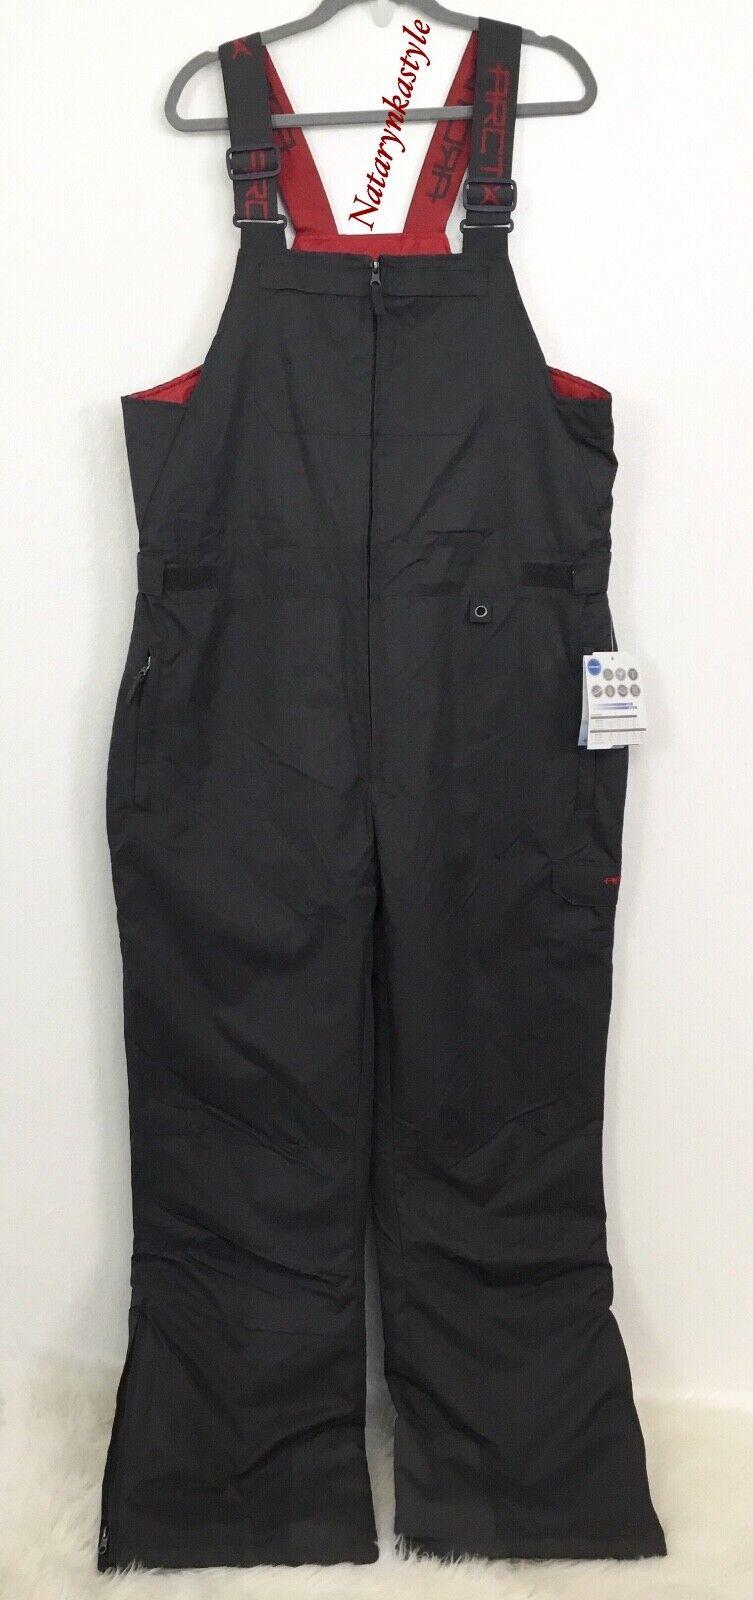 NEW Arctix Insulated Bib  O lls Pants Size XL  hot